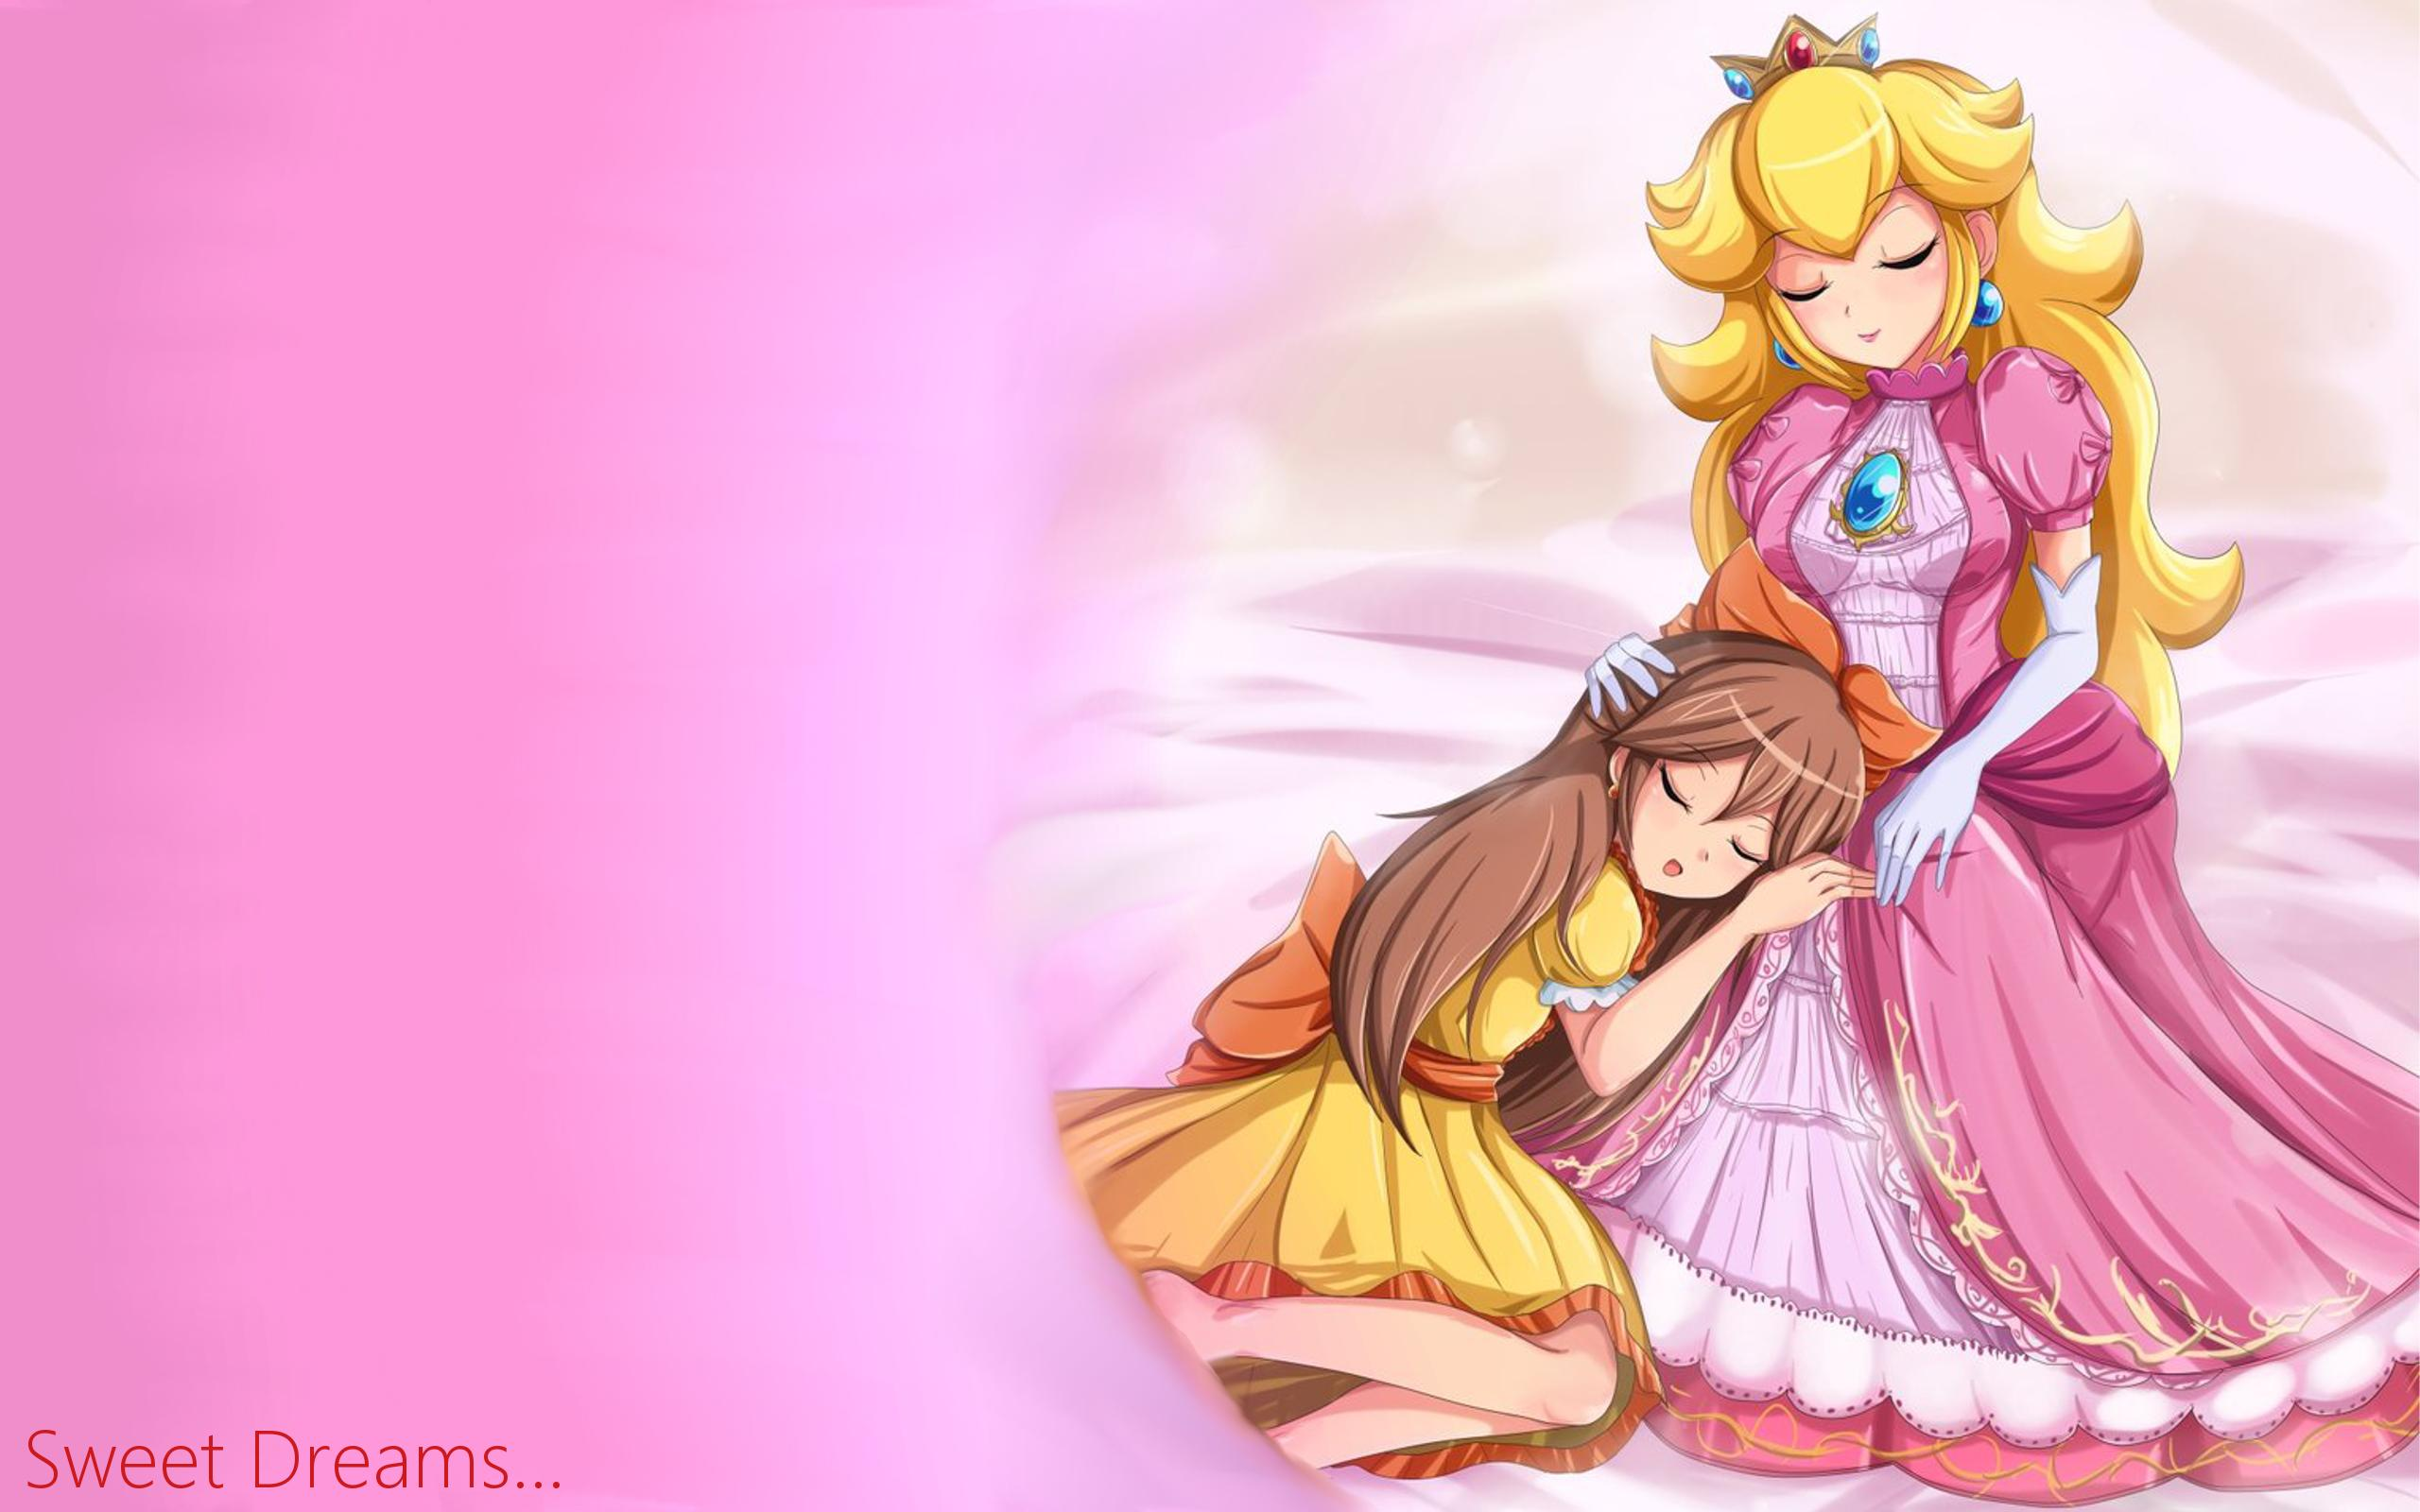 Princess Peach Wallpapers - Wallpaper Cave